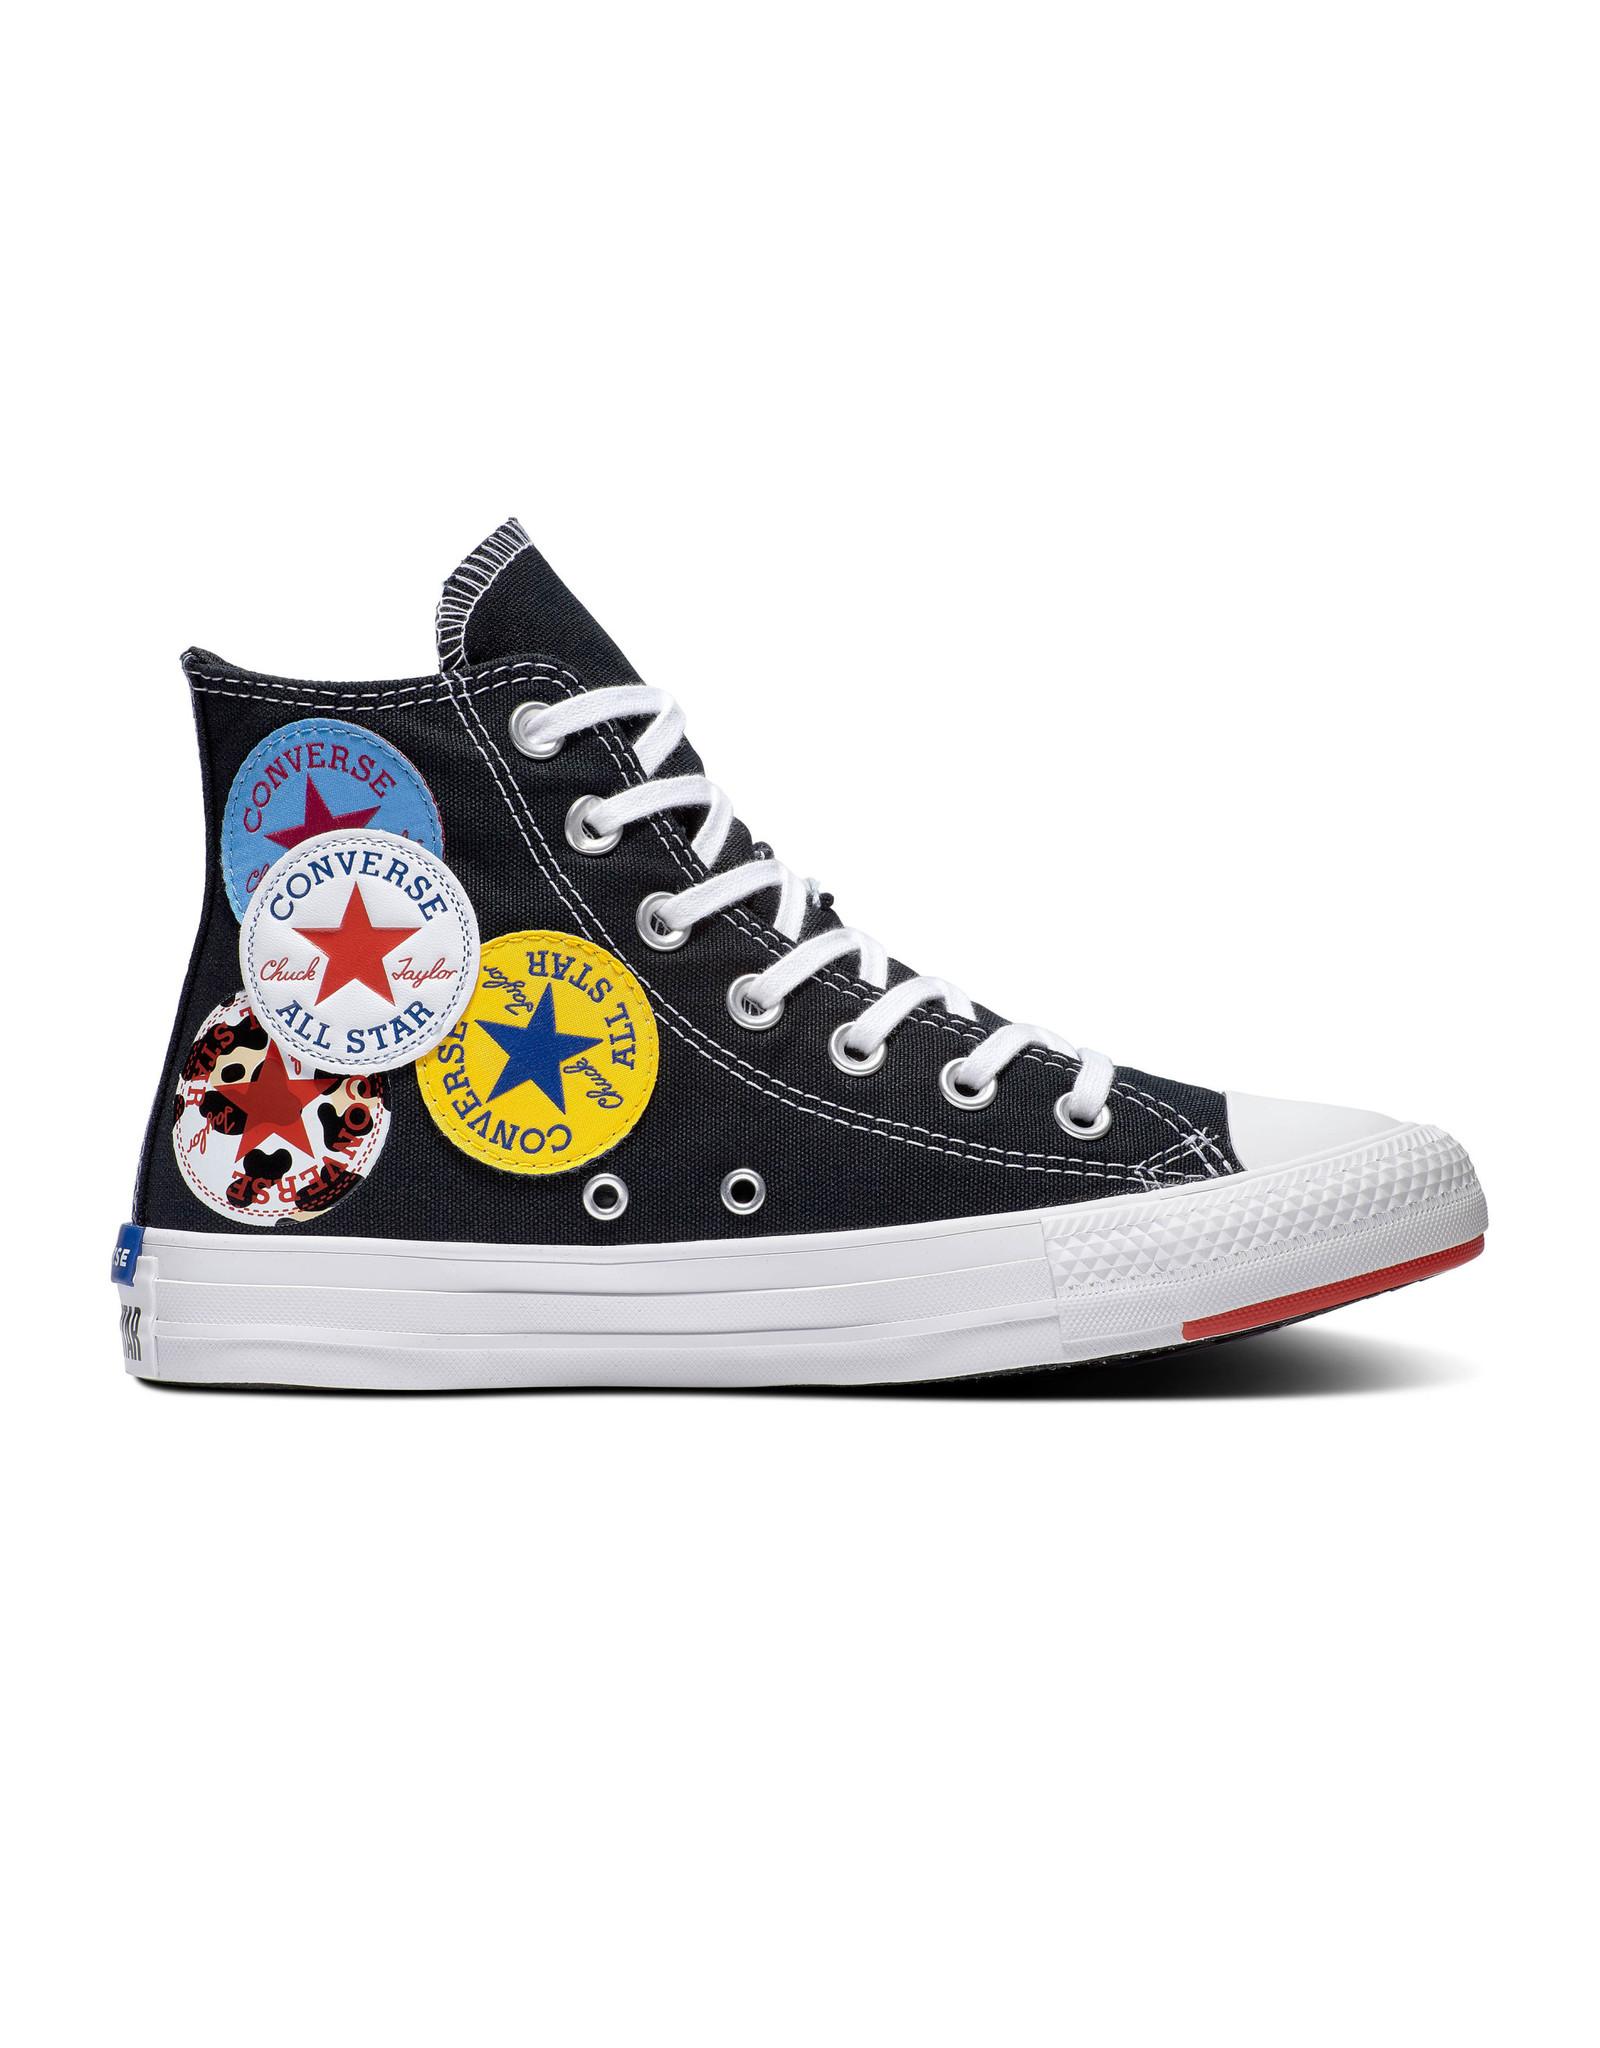 CONVERSE CHUCK TAYLOR ALL STAR  HI BLACK/UNIVERSITY RED/AMARILLO C20LOB-166734C